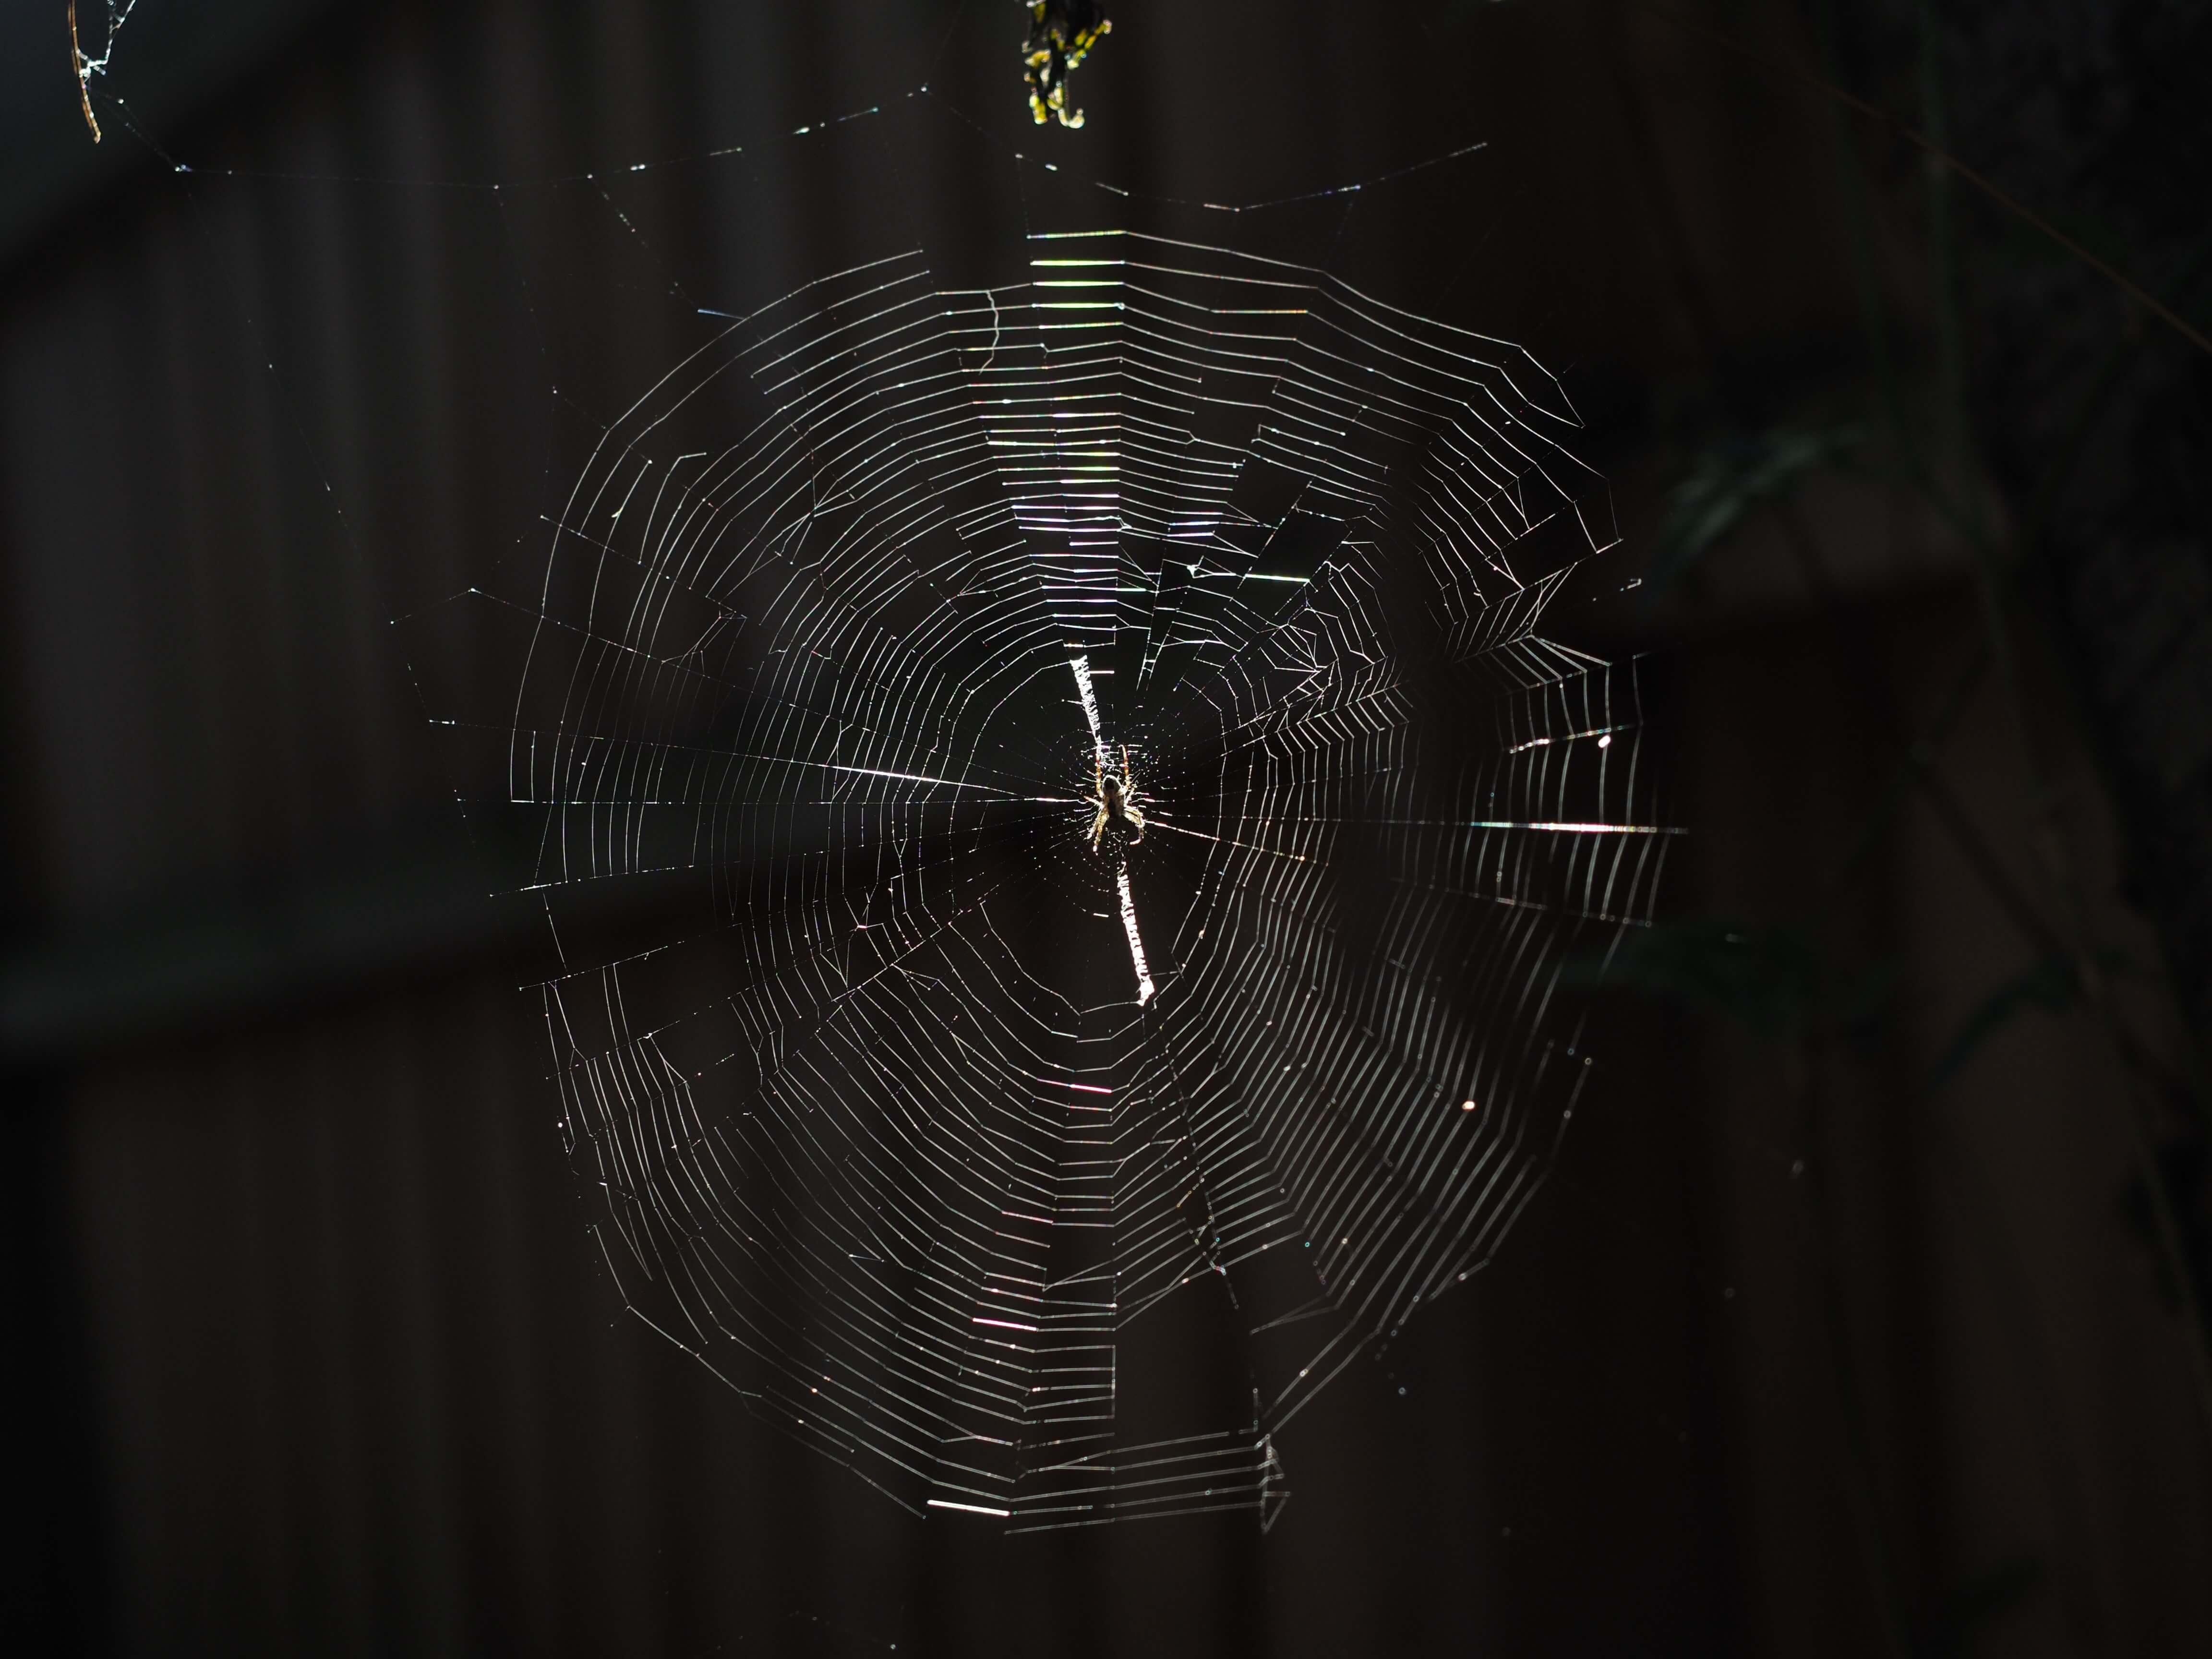 夢 蜘蛛 の